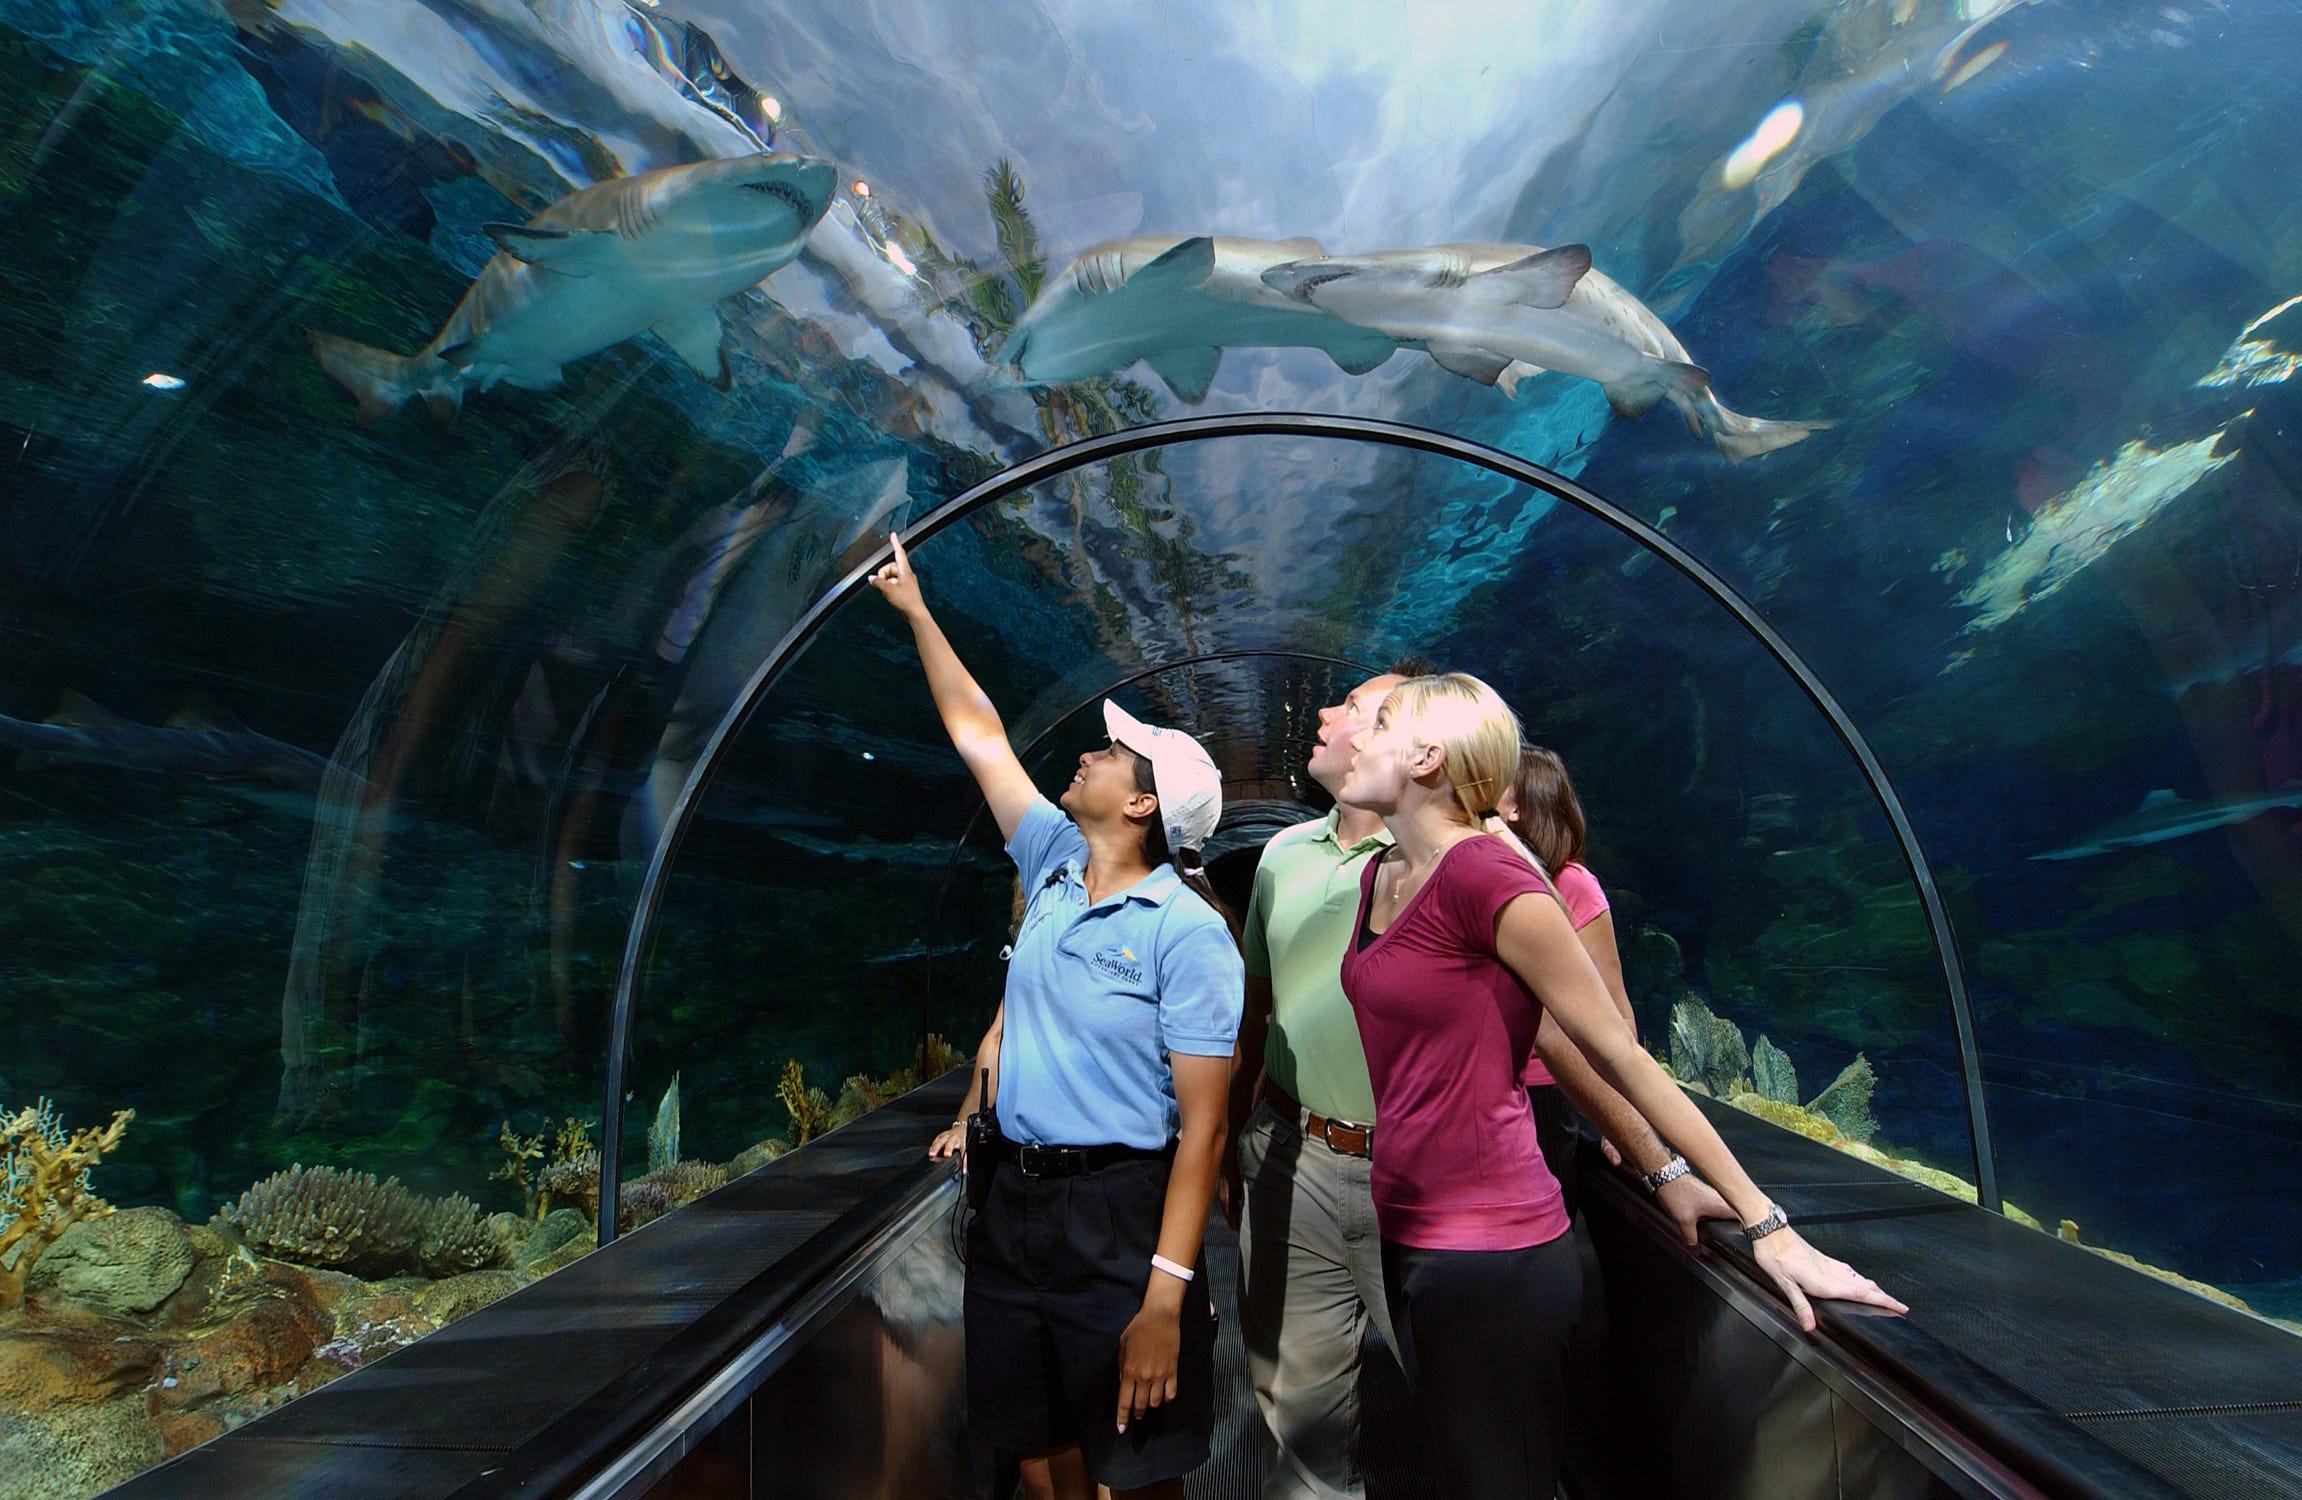 The Shark Tunnel At SeaWorld San Diego.